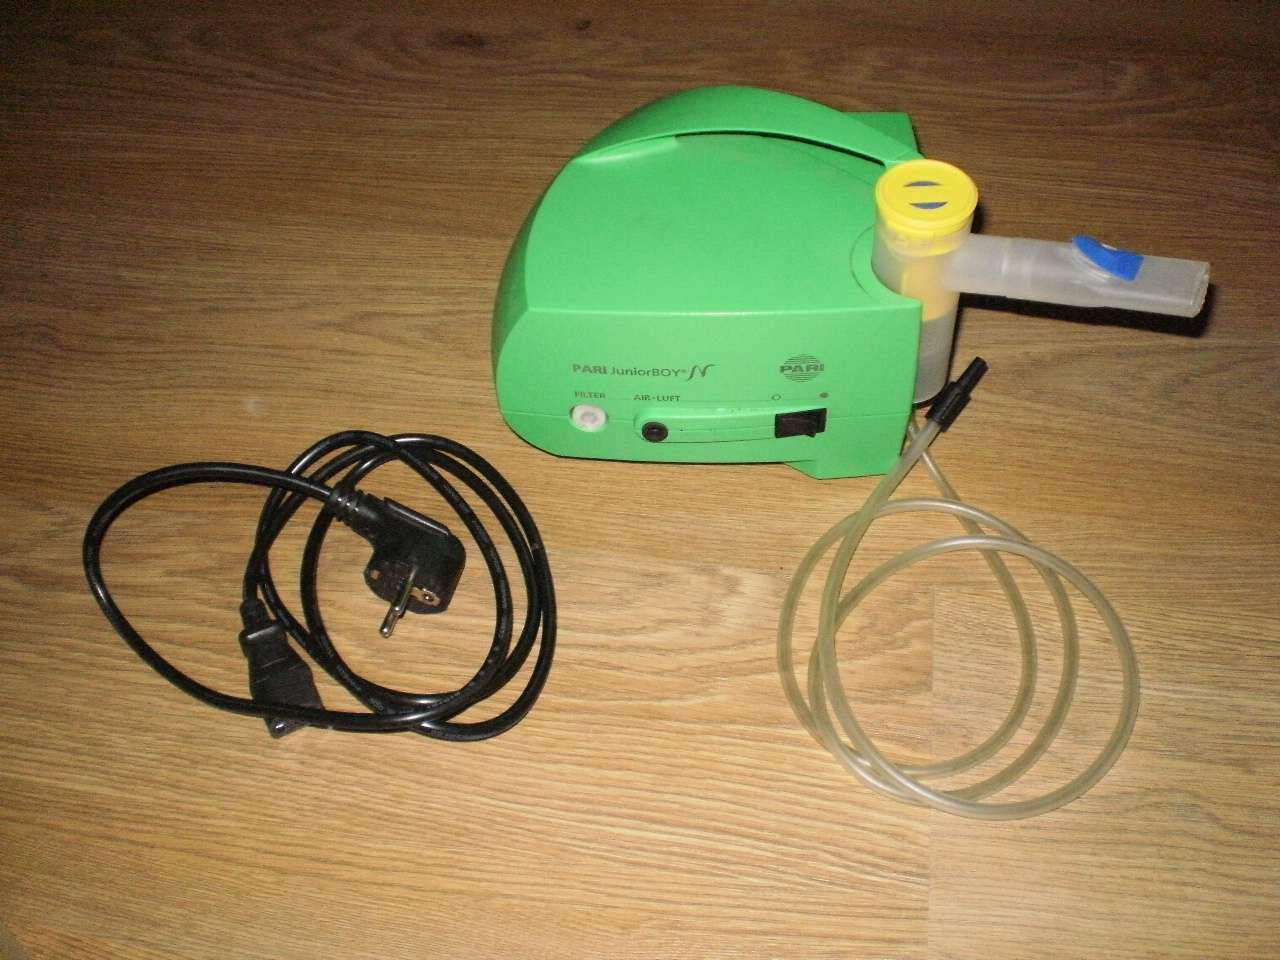 inhalator pari junior boy 10299334. Black Bedroom Furniture Sets. Home Design Ideas